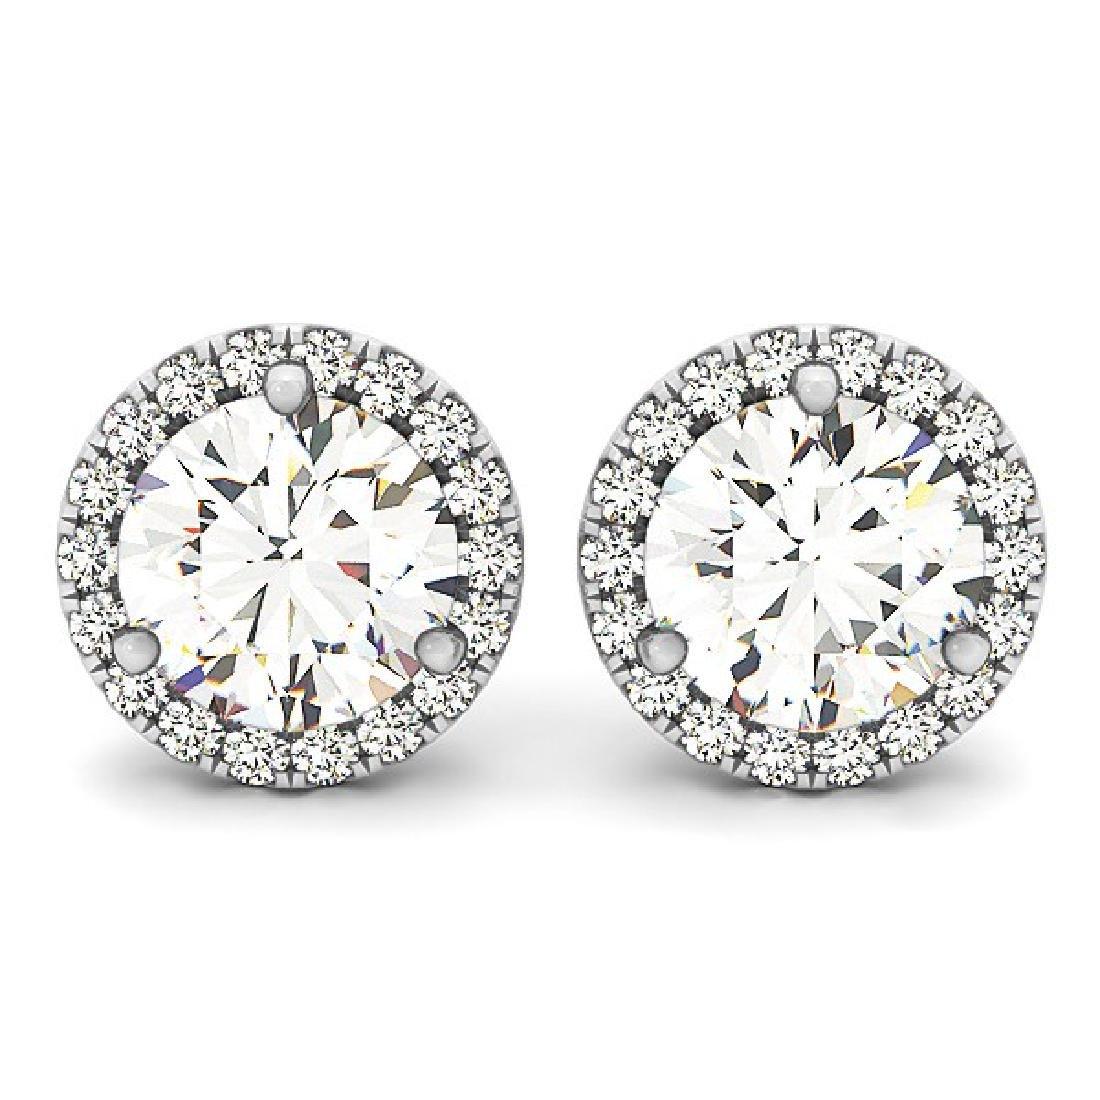 3.35 CTW Diamond Solitaire Earrings VS/SI Certified 14K - 2